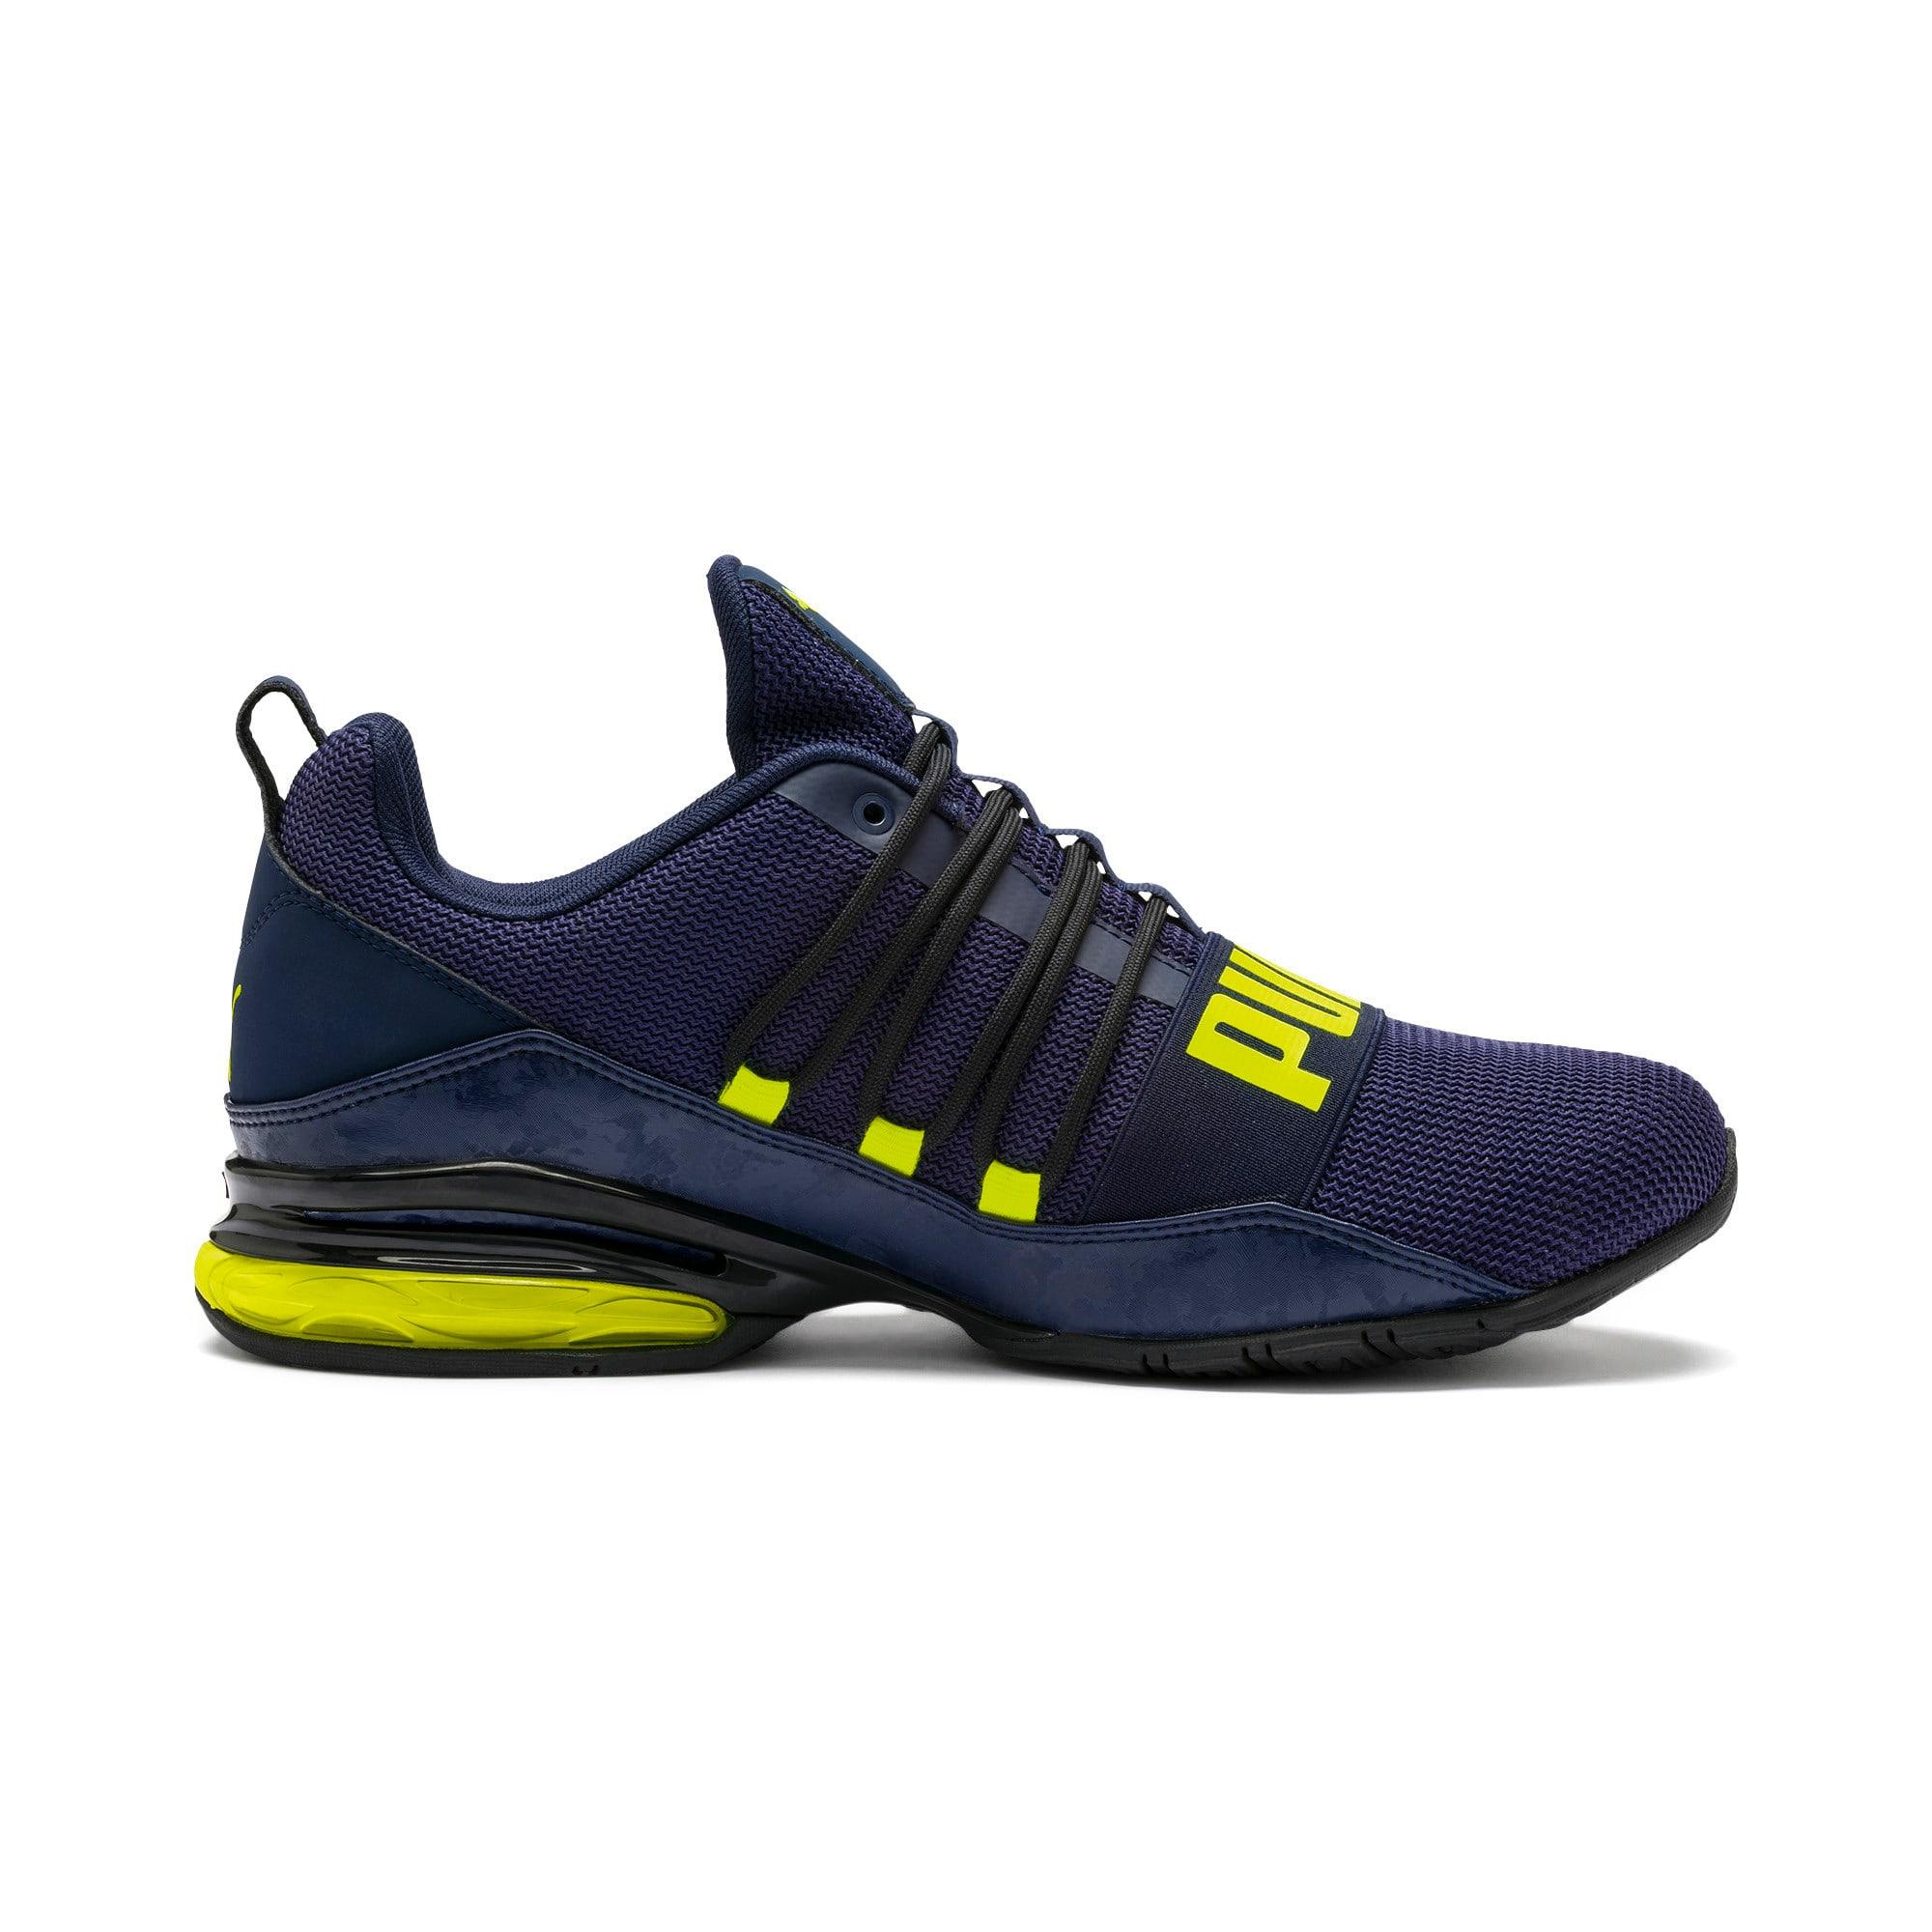 Thumbnail 6 of CELL Regulate Camo Men's Training Shoes, Peacoat-Yellow Alert, medium